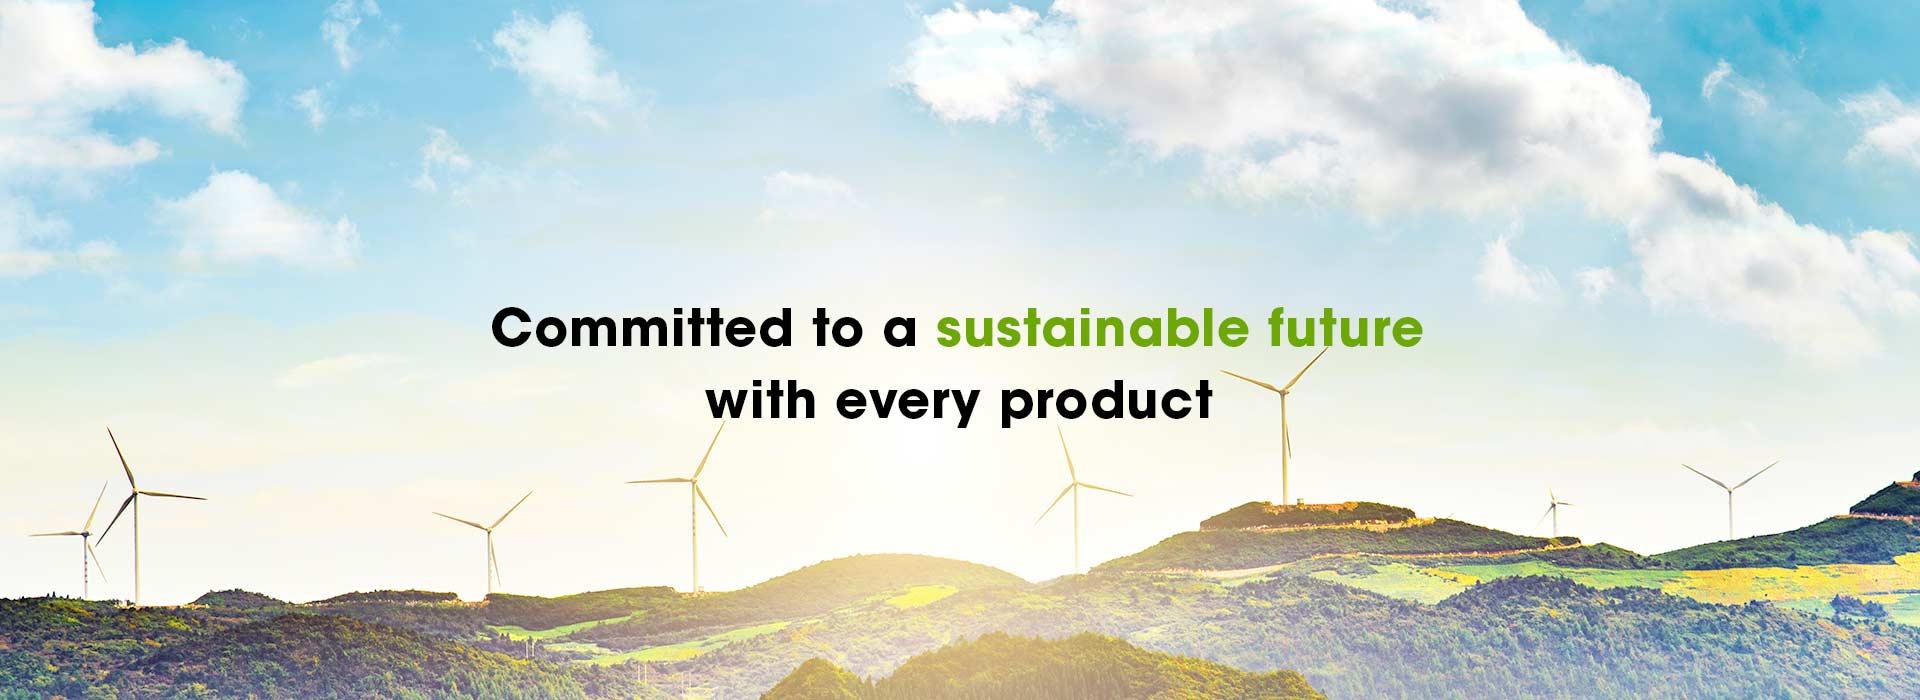 4-sustainble-banner